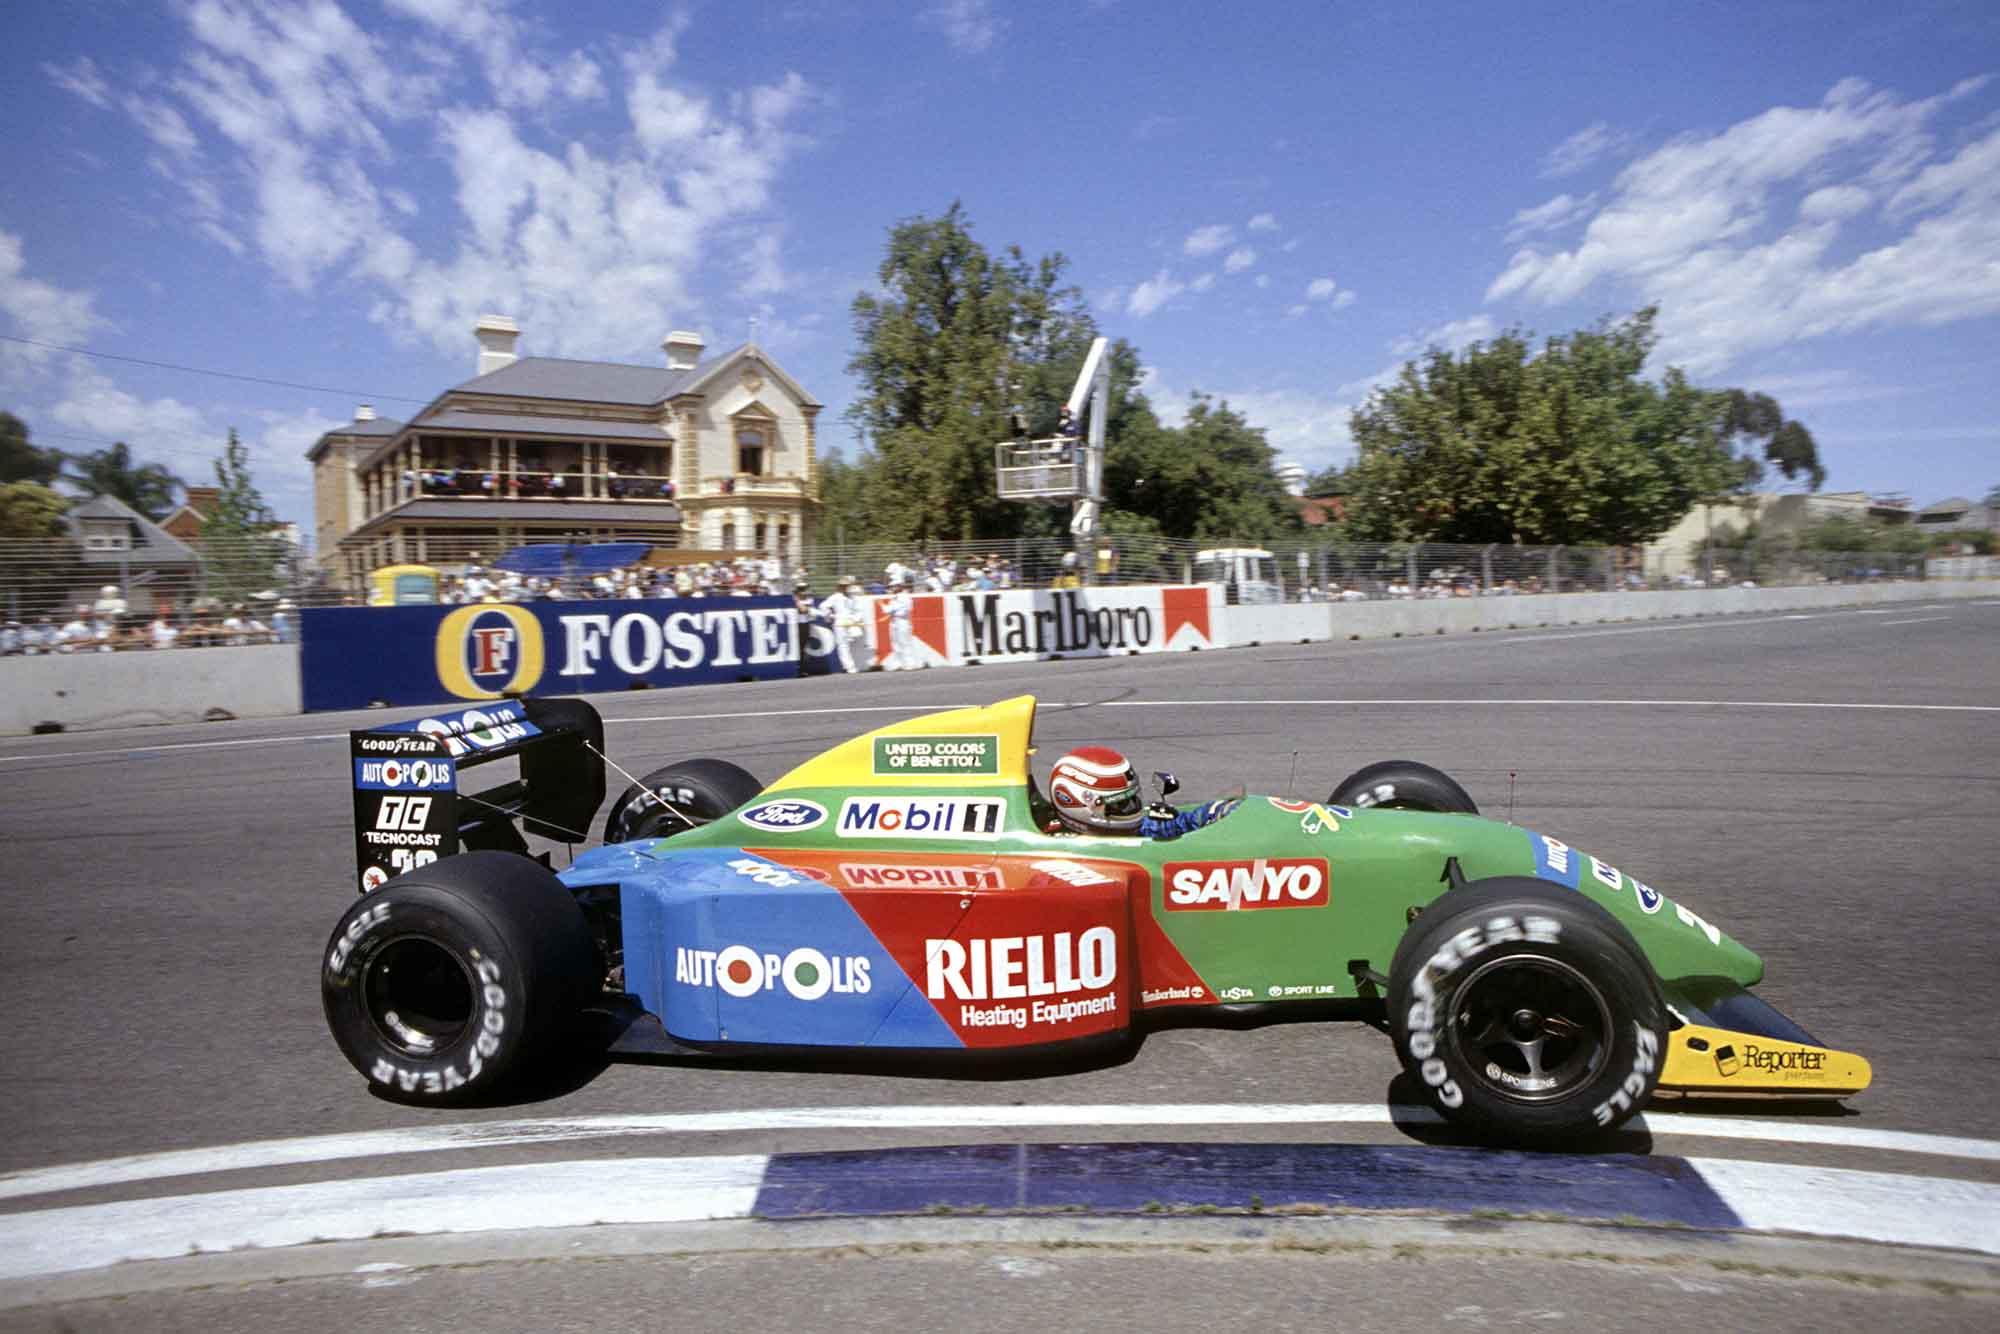 Nelson Piquet wins the 1990 Australian Grand Prix for Benetton-Ford